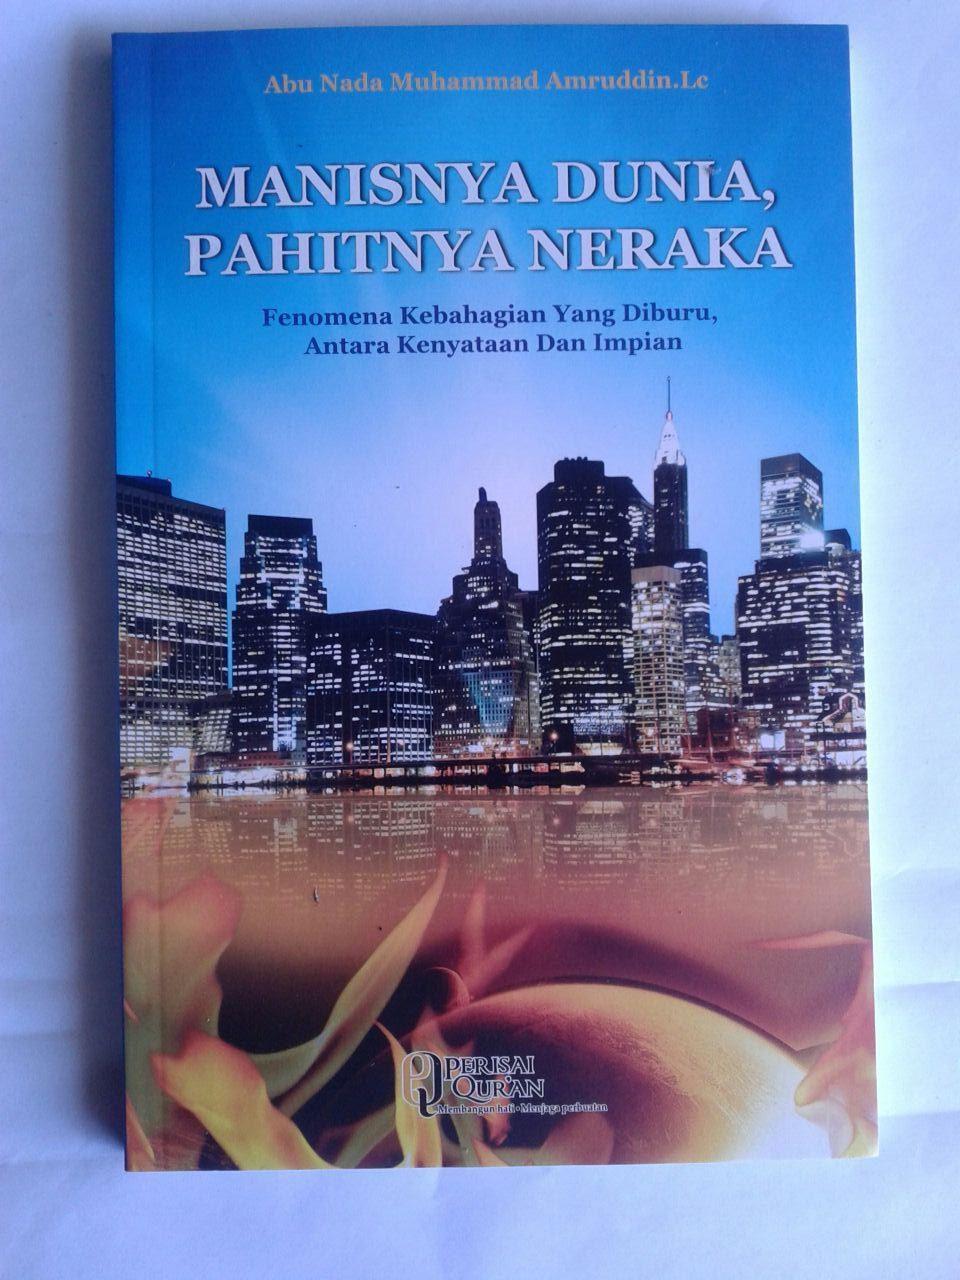 Buku Manisnya Dunia Pahitnya Neraka cover 2